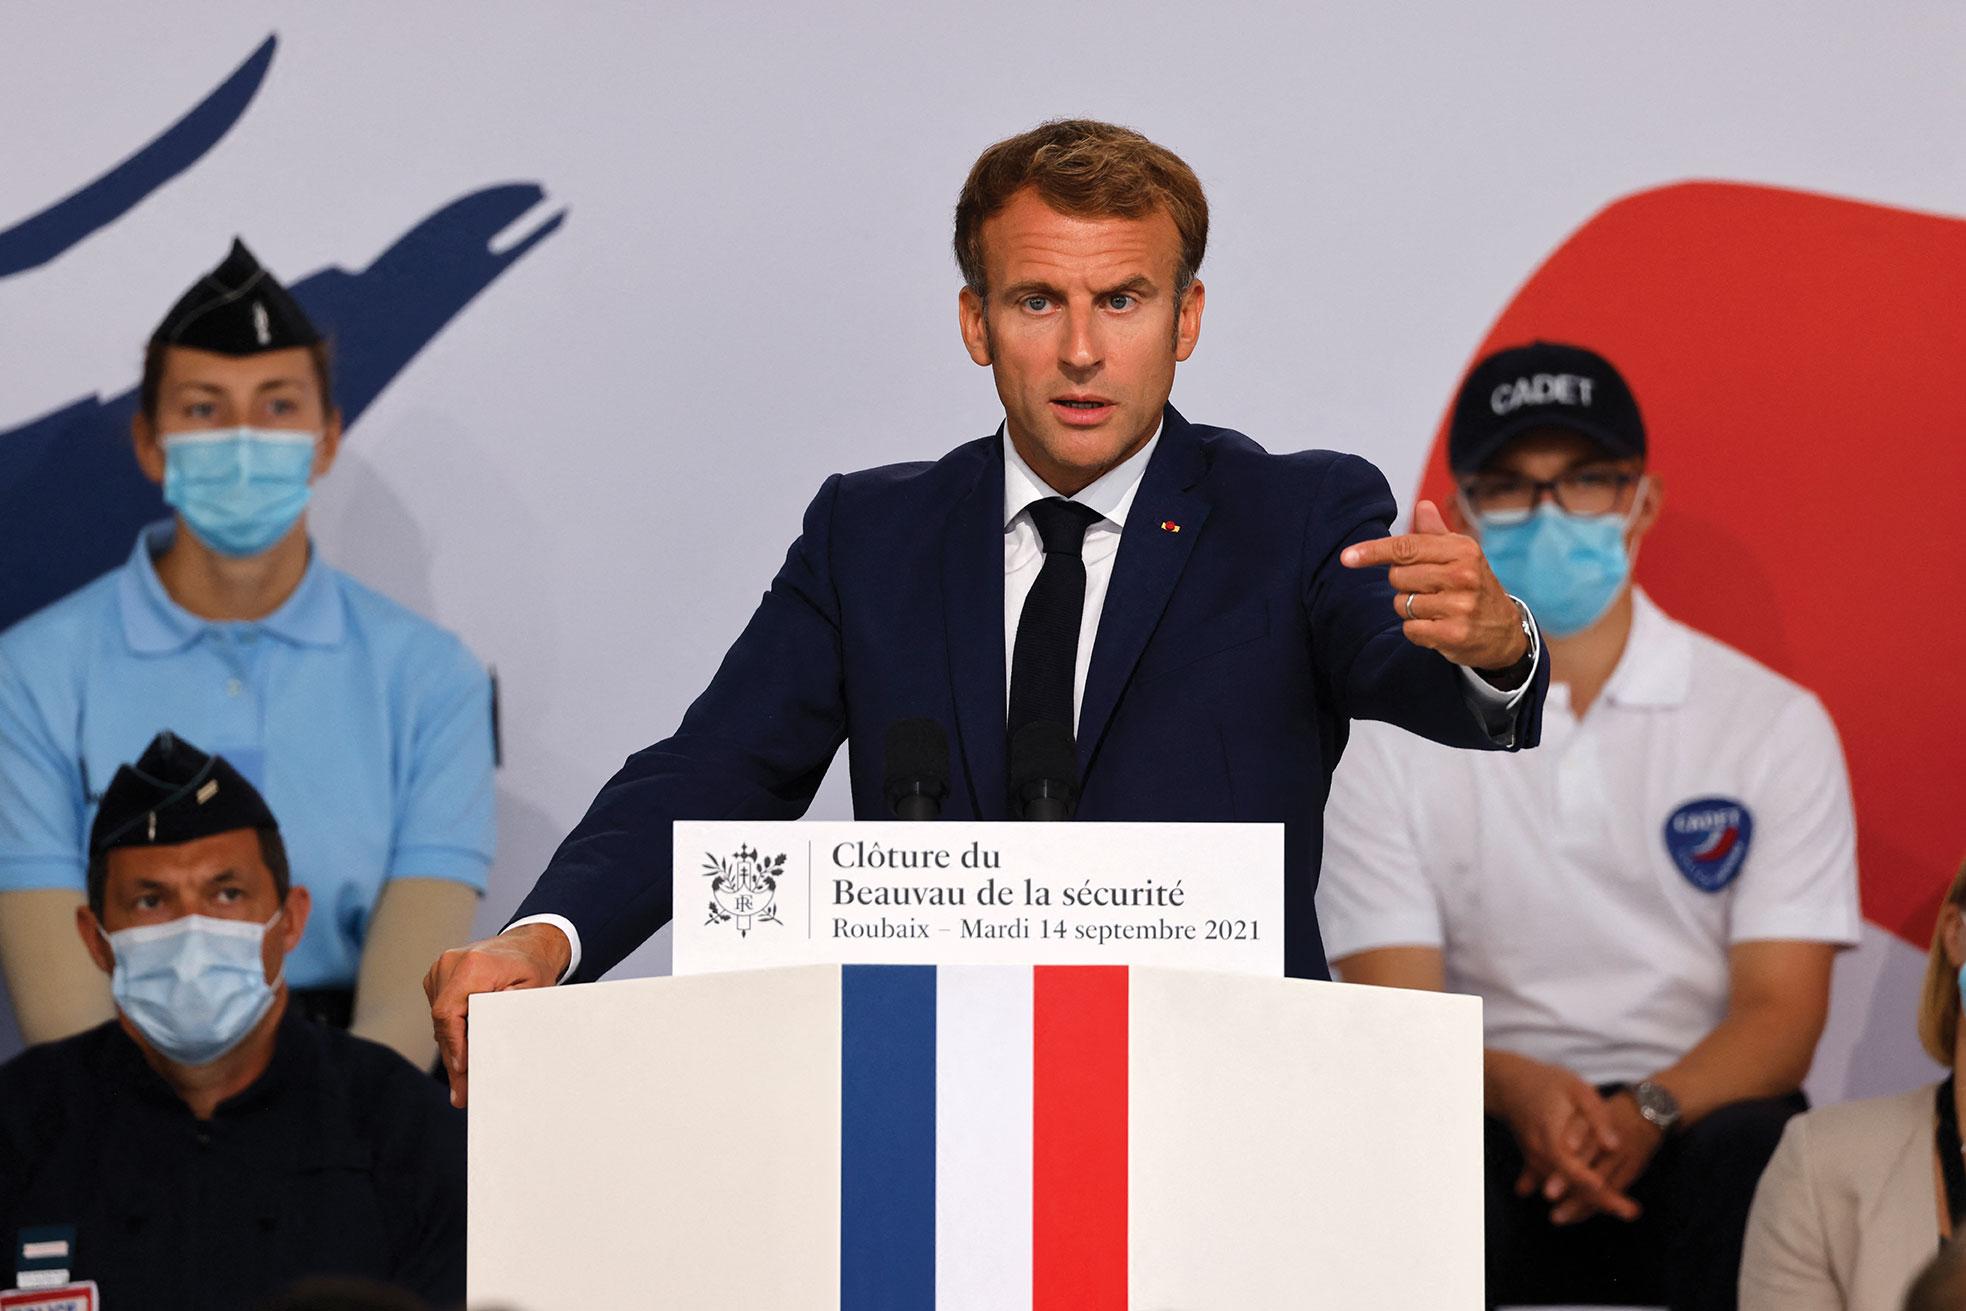 Ludovic MARIN / POOL / AFP